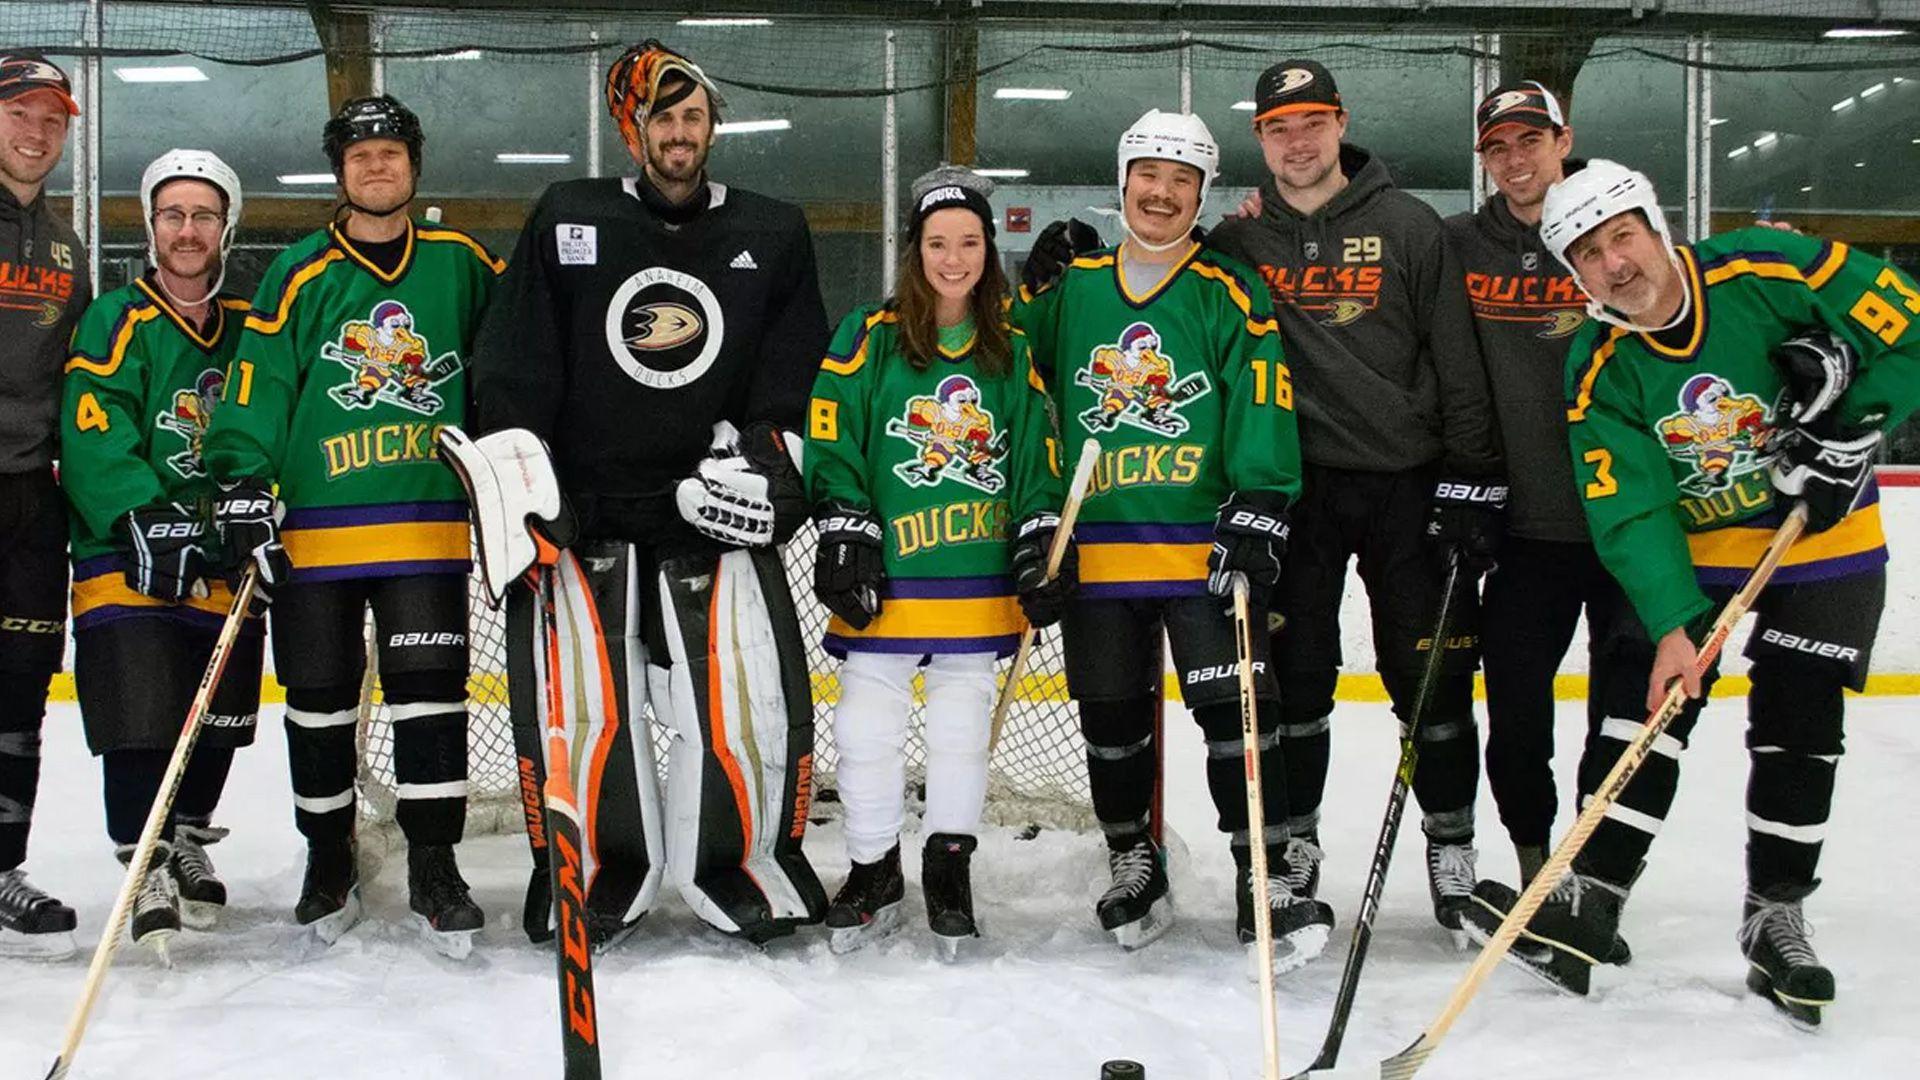 The Mighty Ducks In 2020 Disney Plus New Shows Emilio Estevez